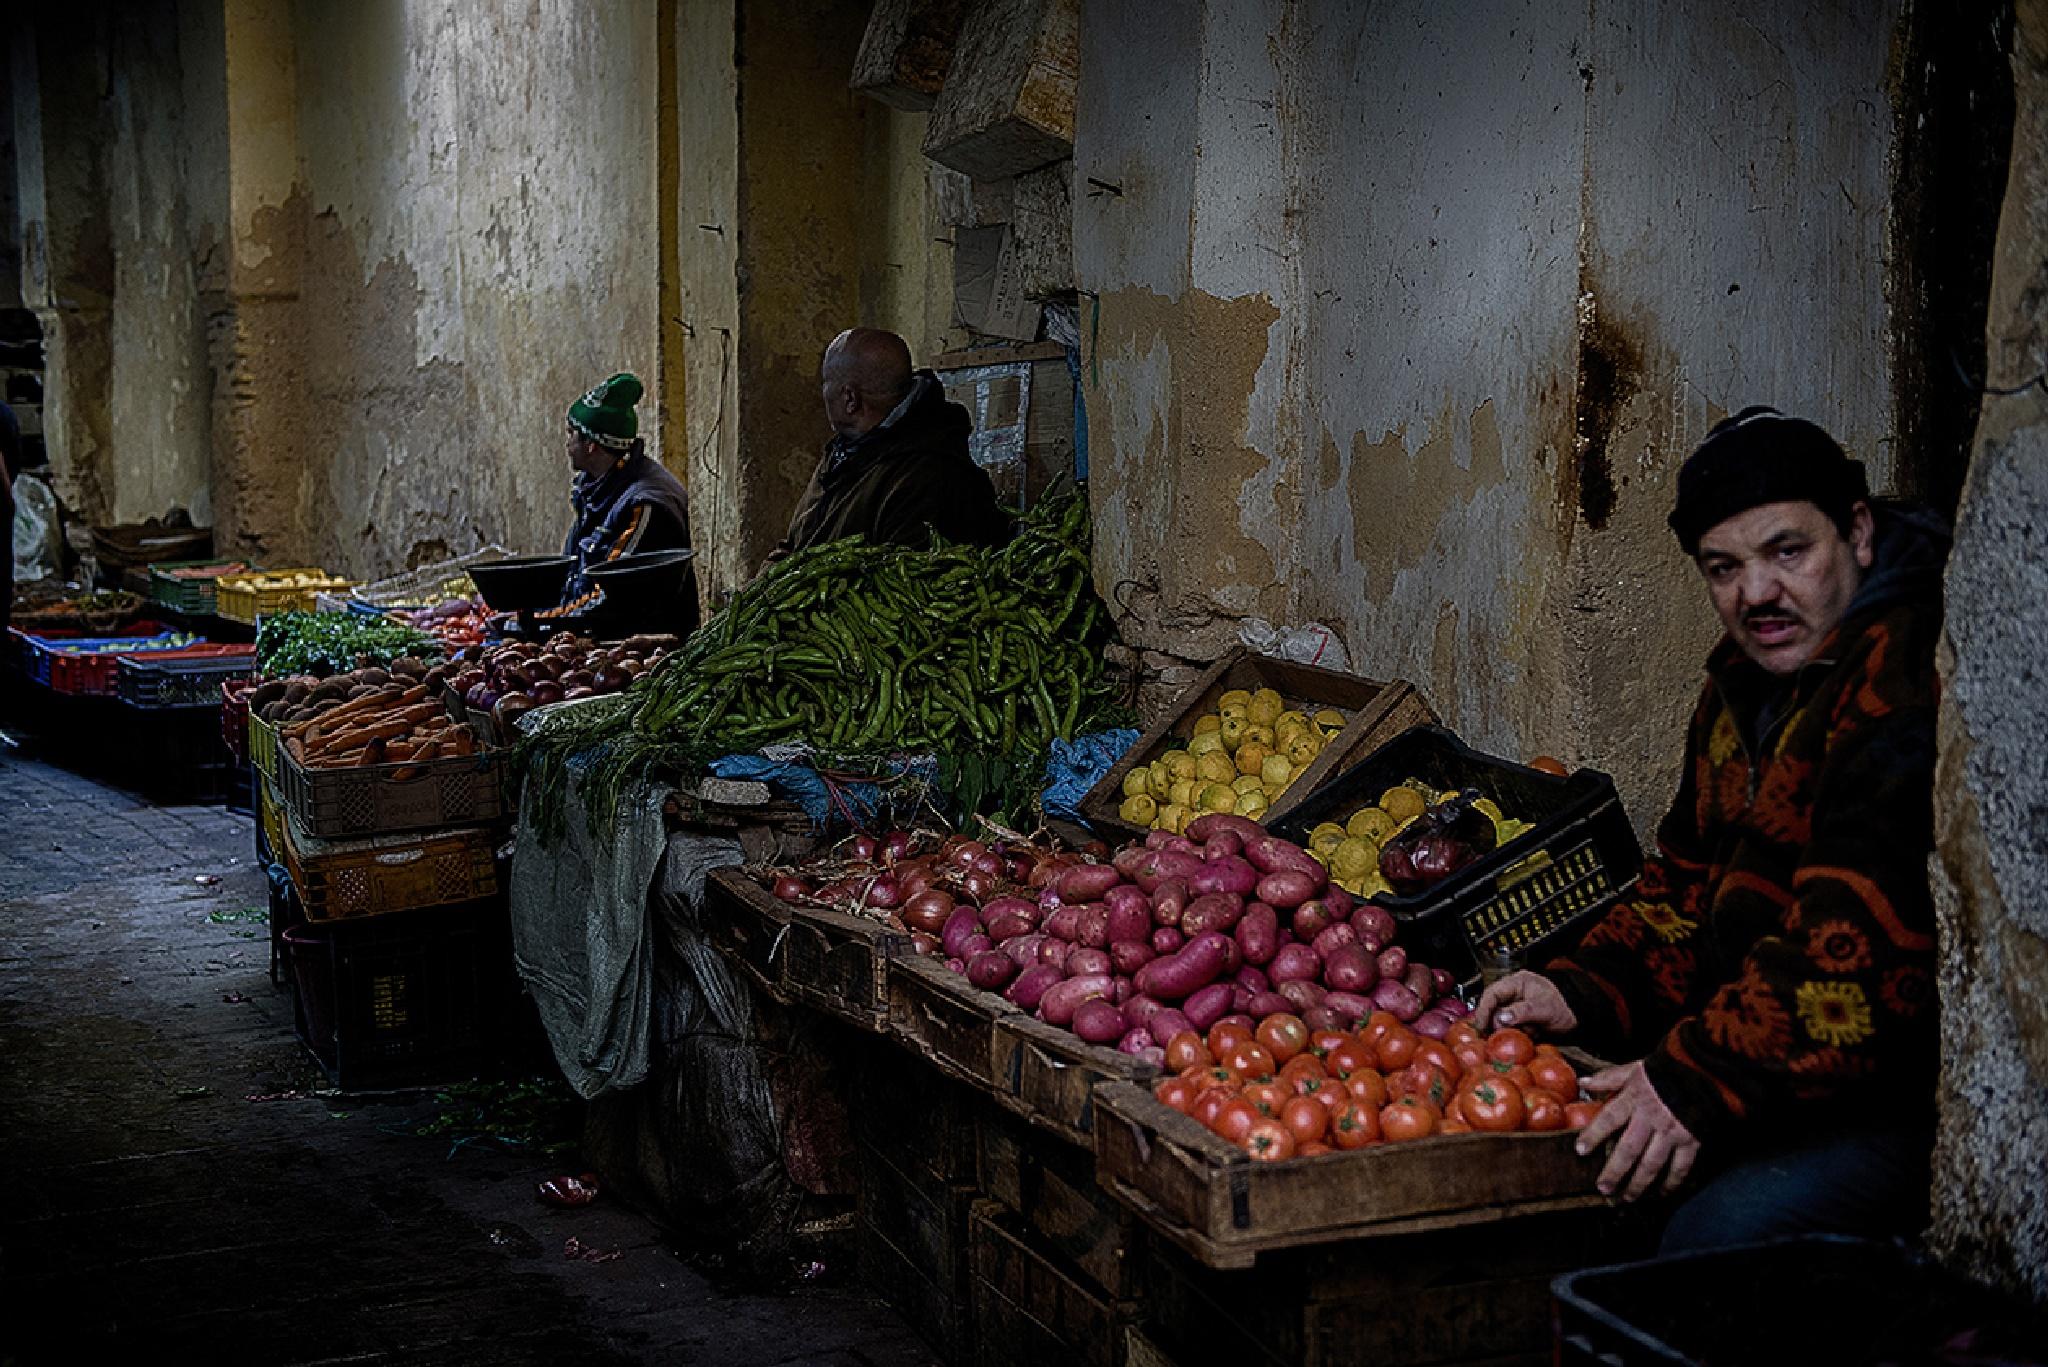 Bazaar in the old town ... by leventyavuz